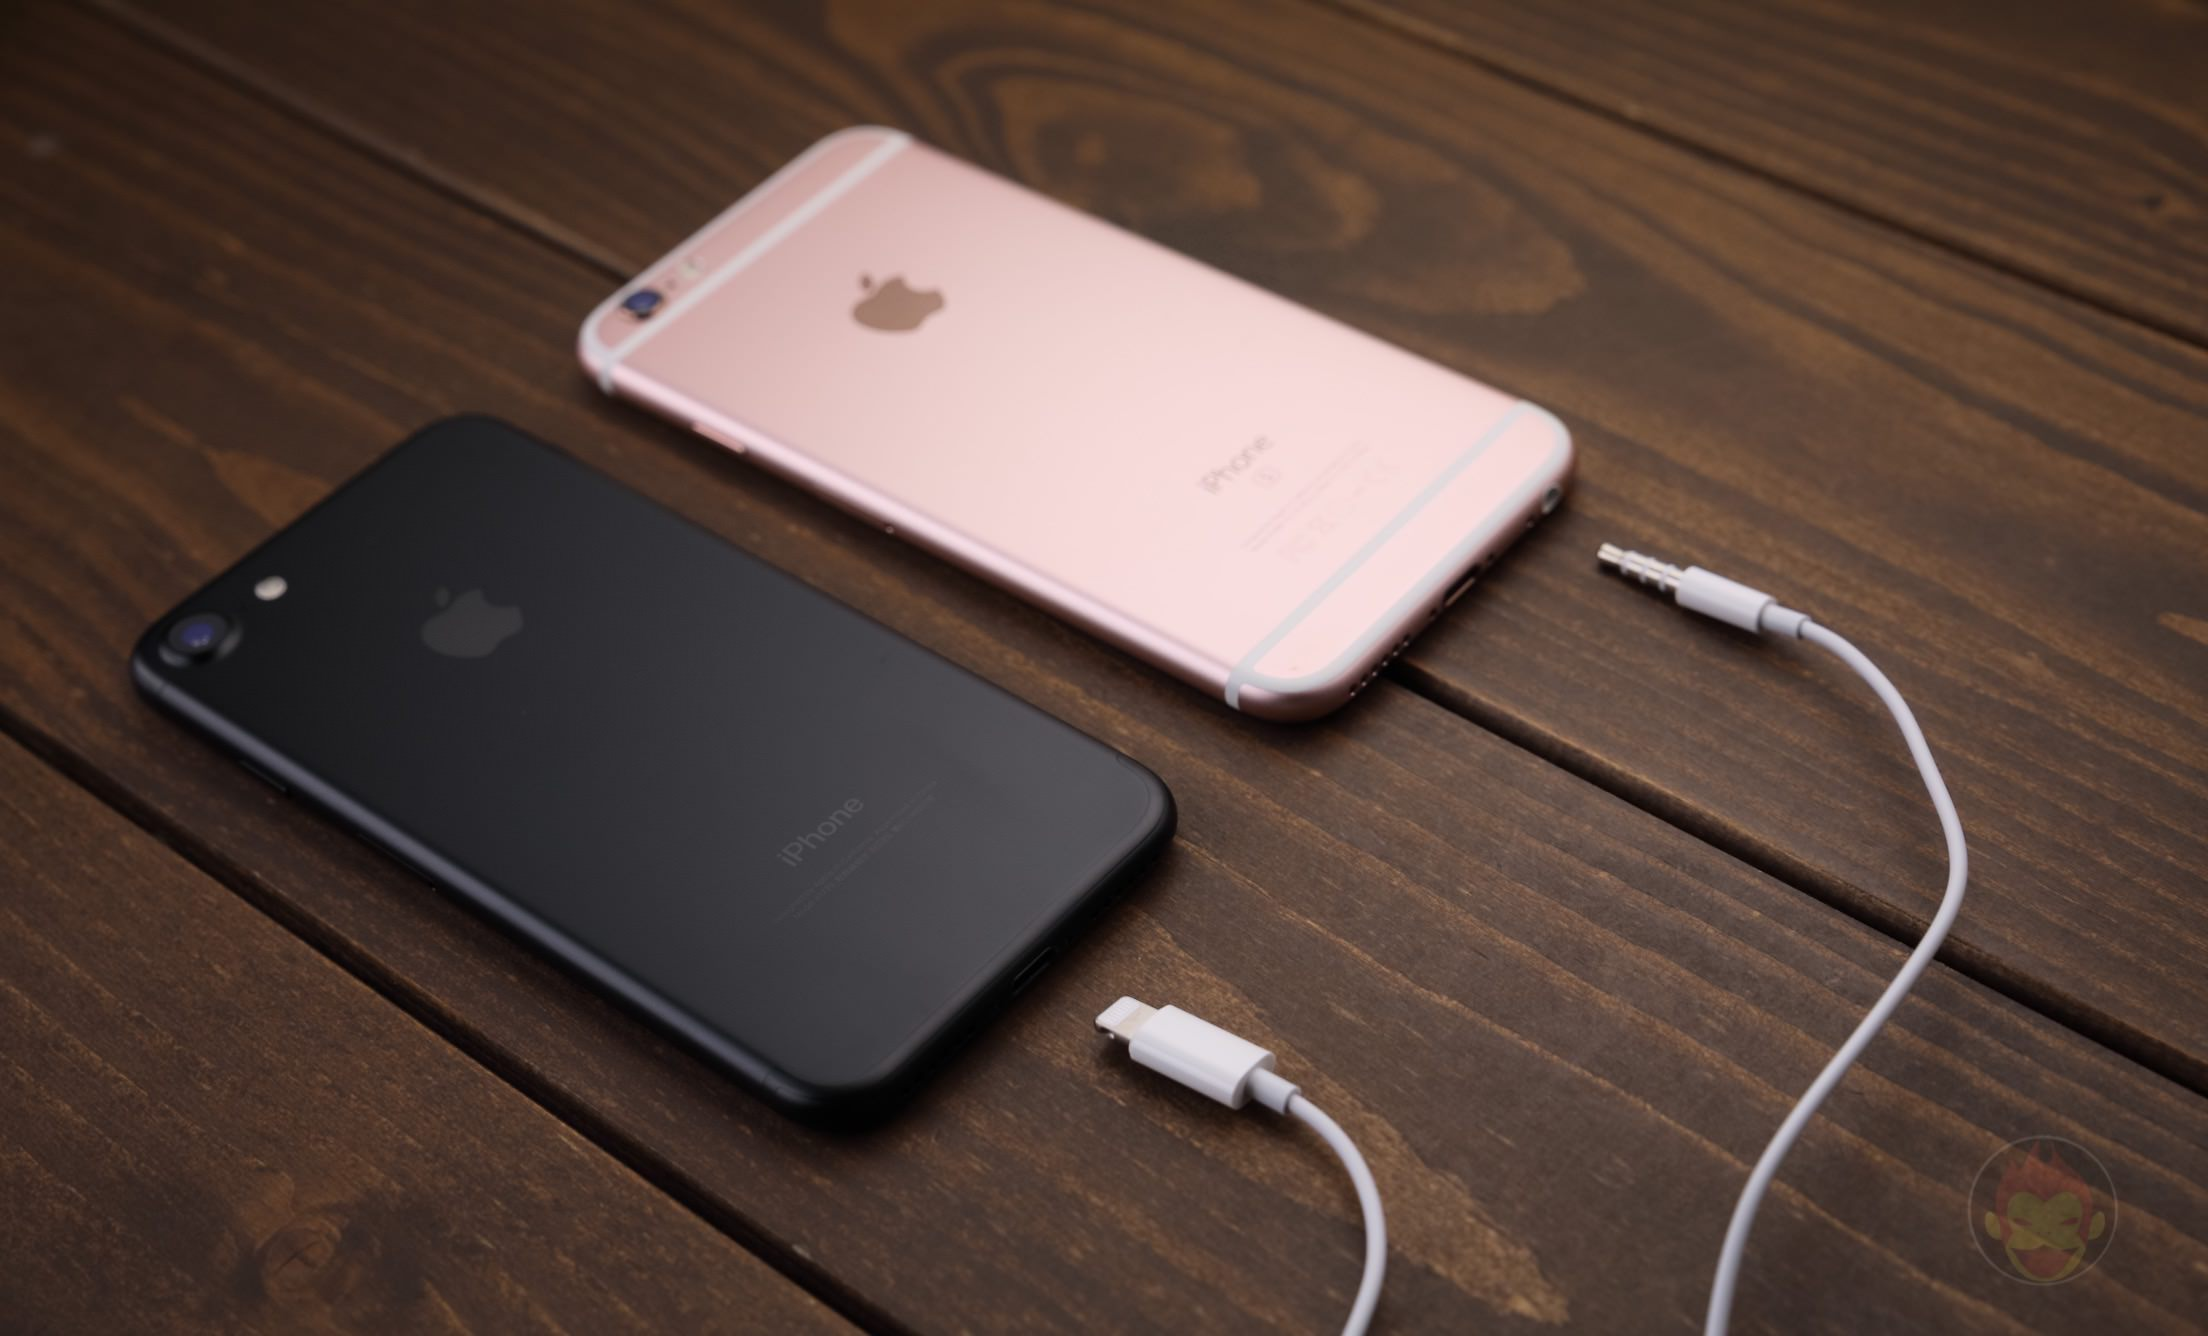 iPhone7-iPhone6s-Comparison-09.jpg